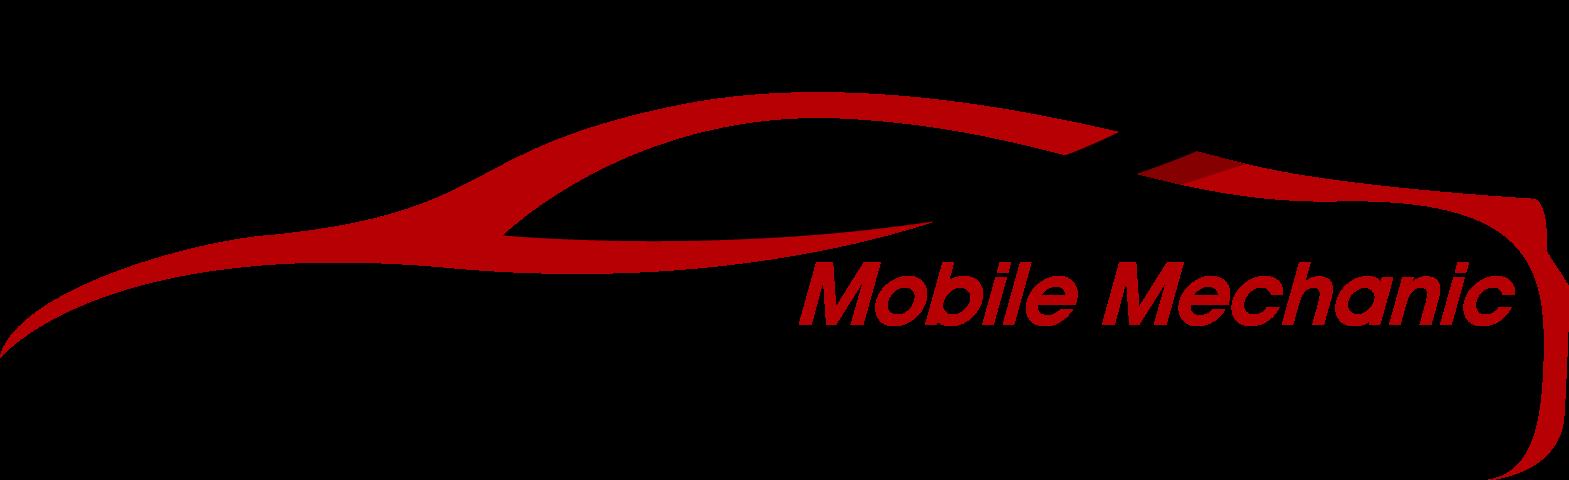 Mobile Mechanic Perth Logo